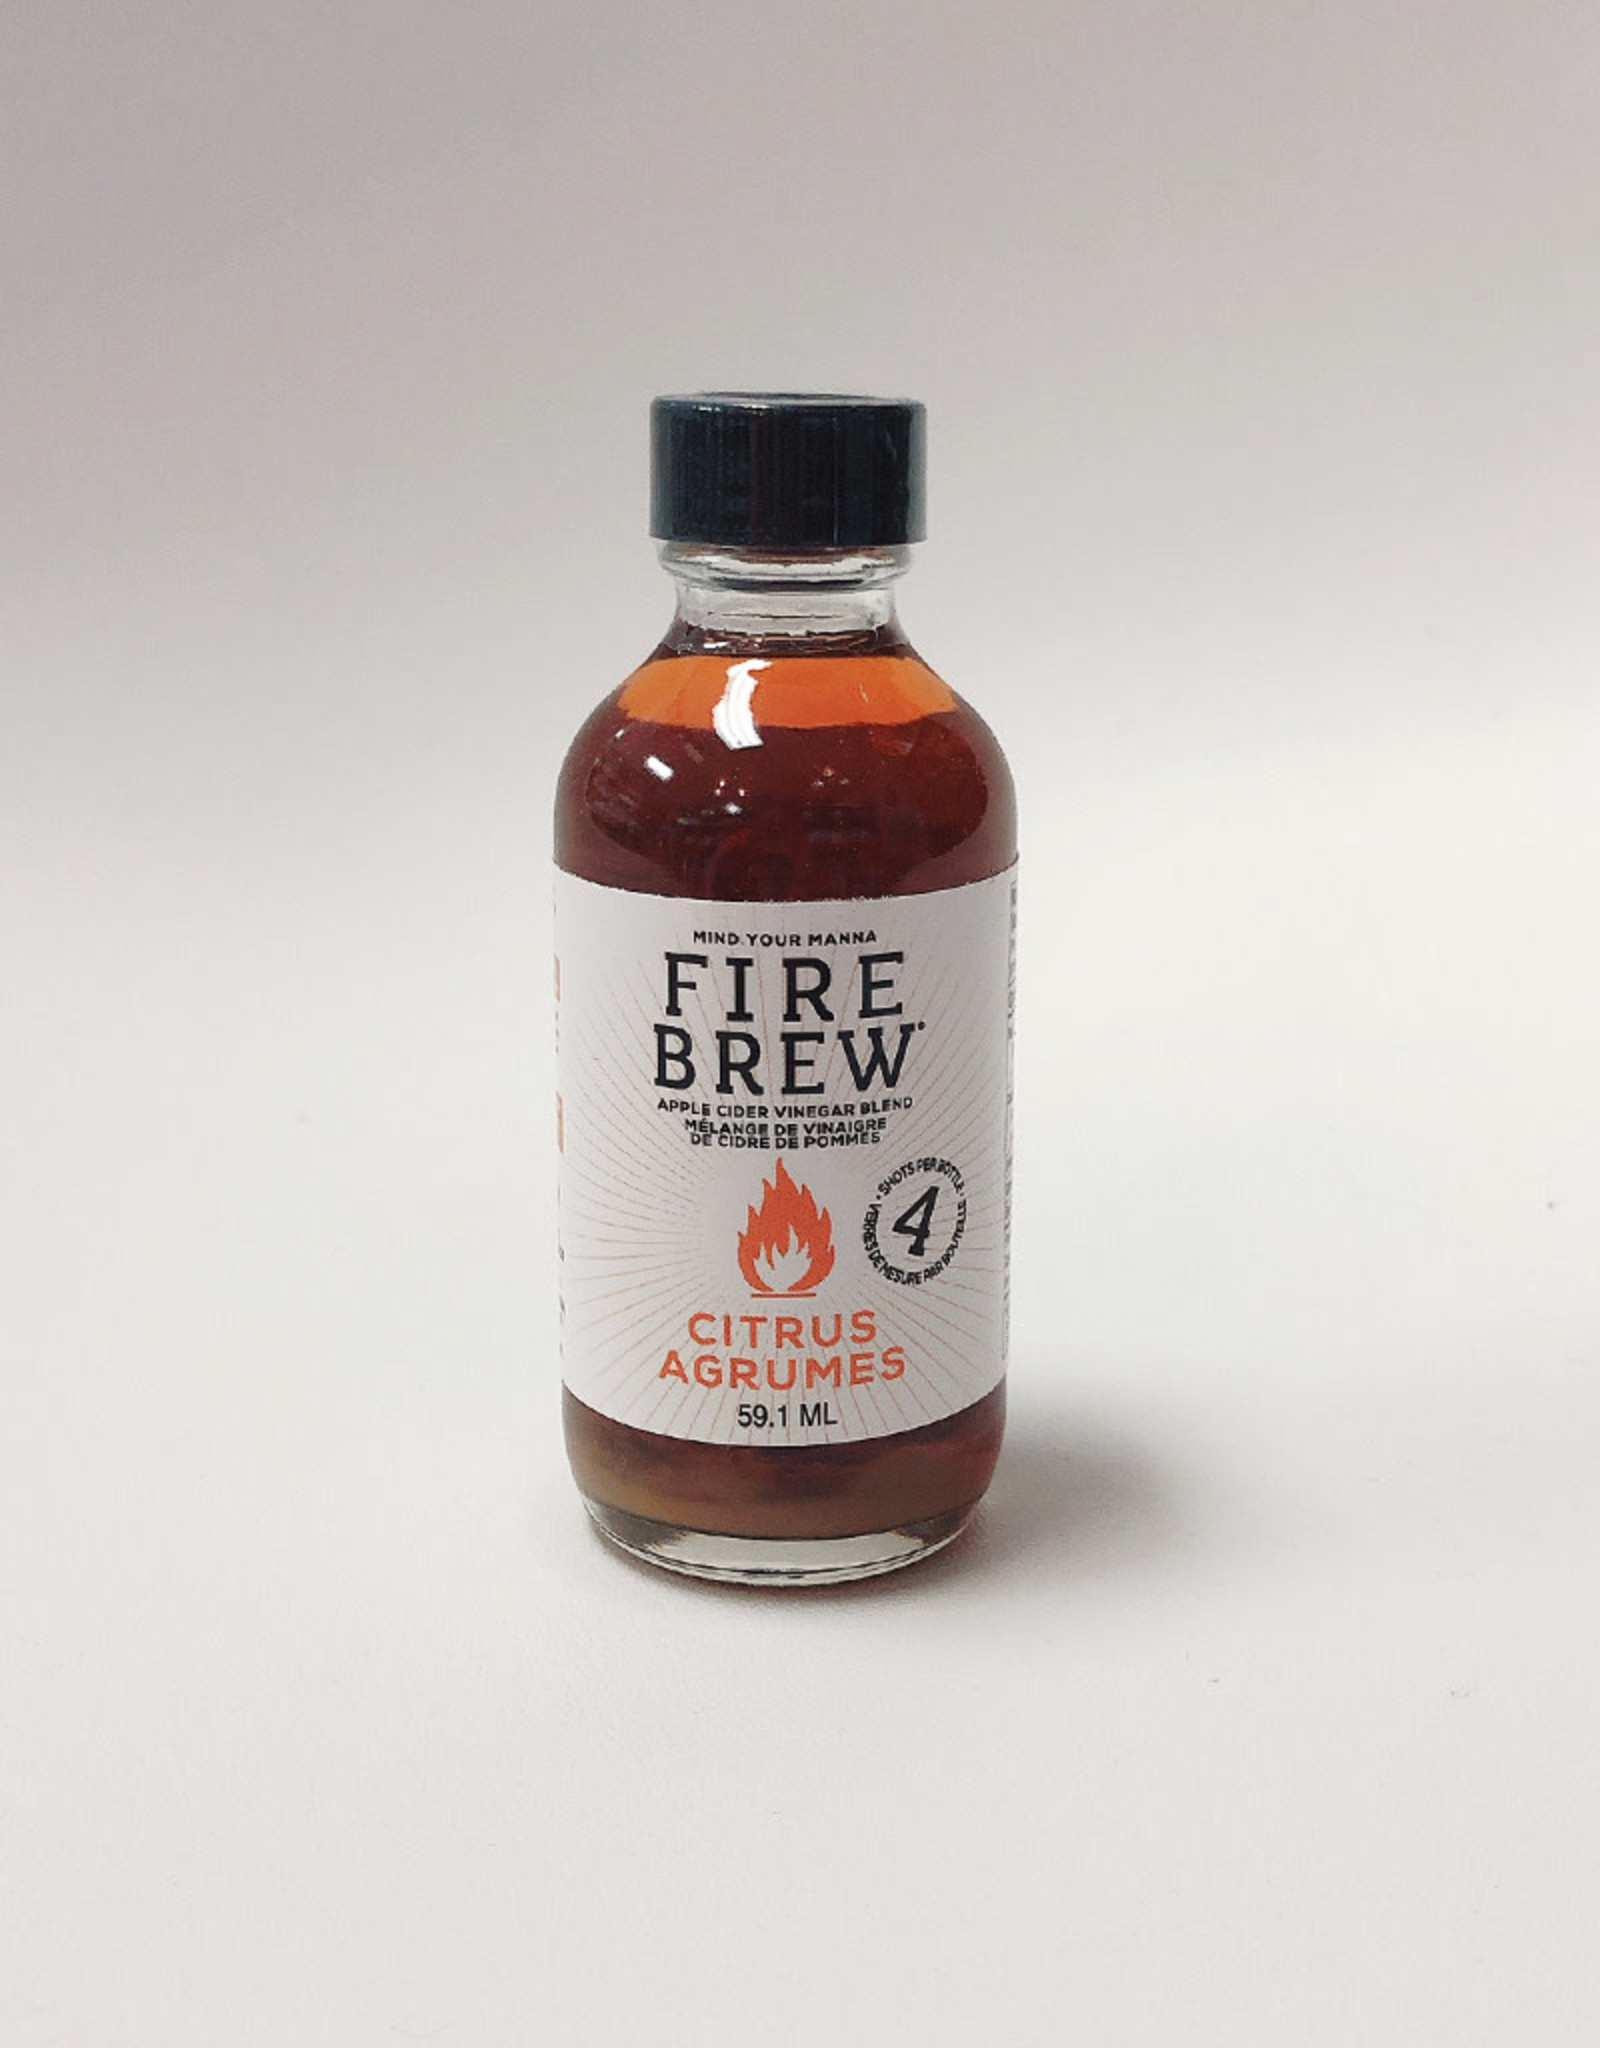 Fire Brew Fire Brew - Apple Cider Vinegar, Citrus (59ml)